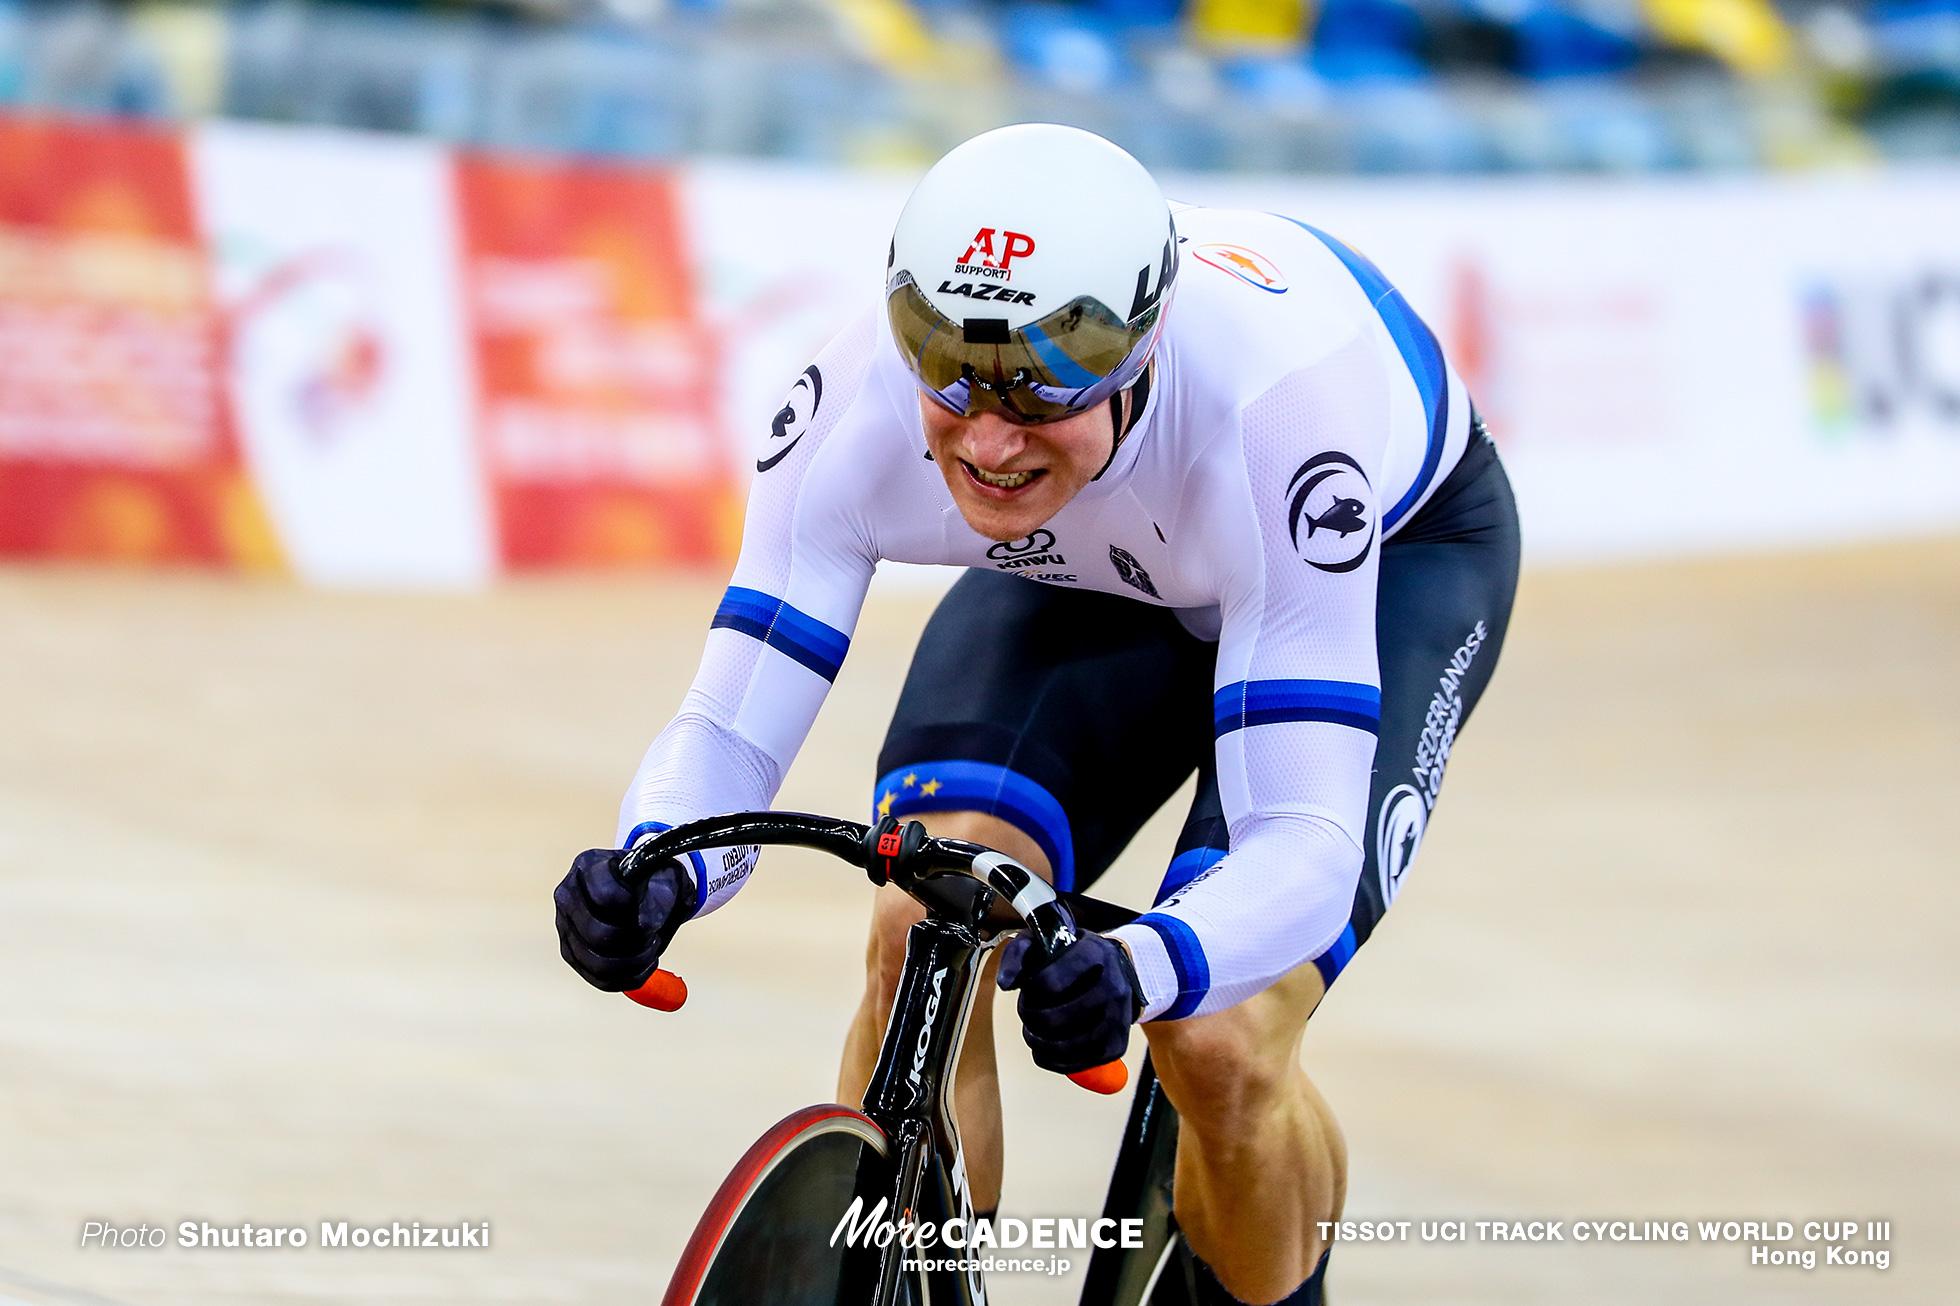 Jeffery Hoogland, Qualifying / Men's Sprint / TISSOT UCI TRACK CYCLING WORLD CUP III, Hong Kong